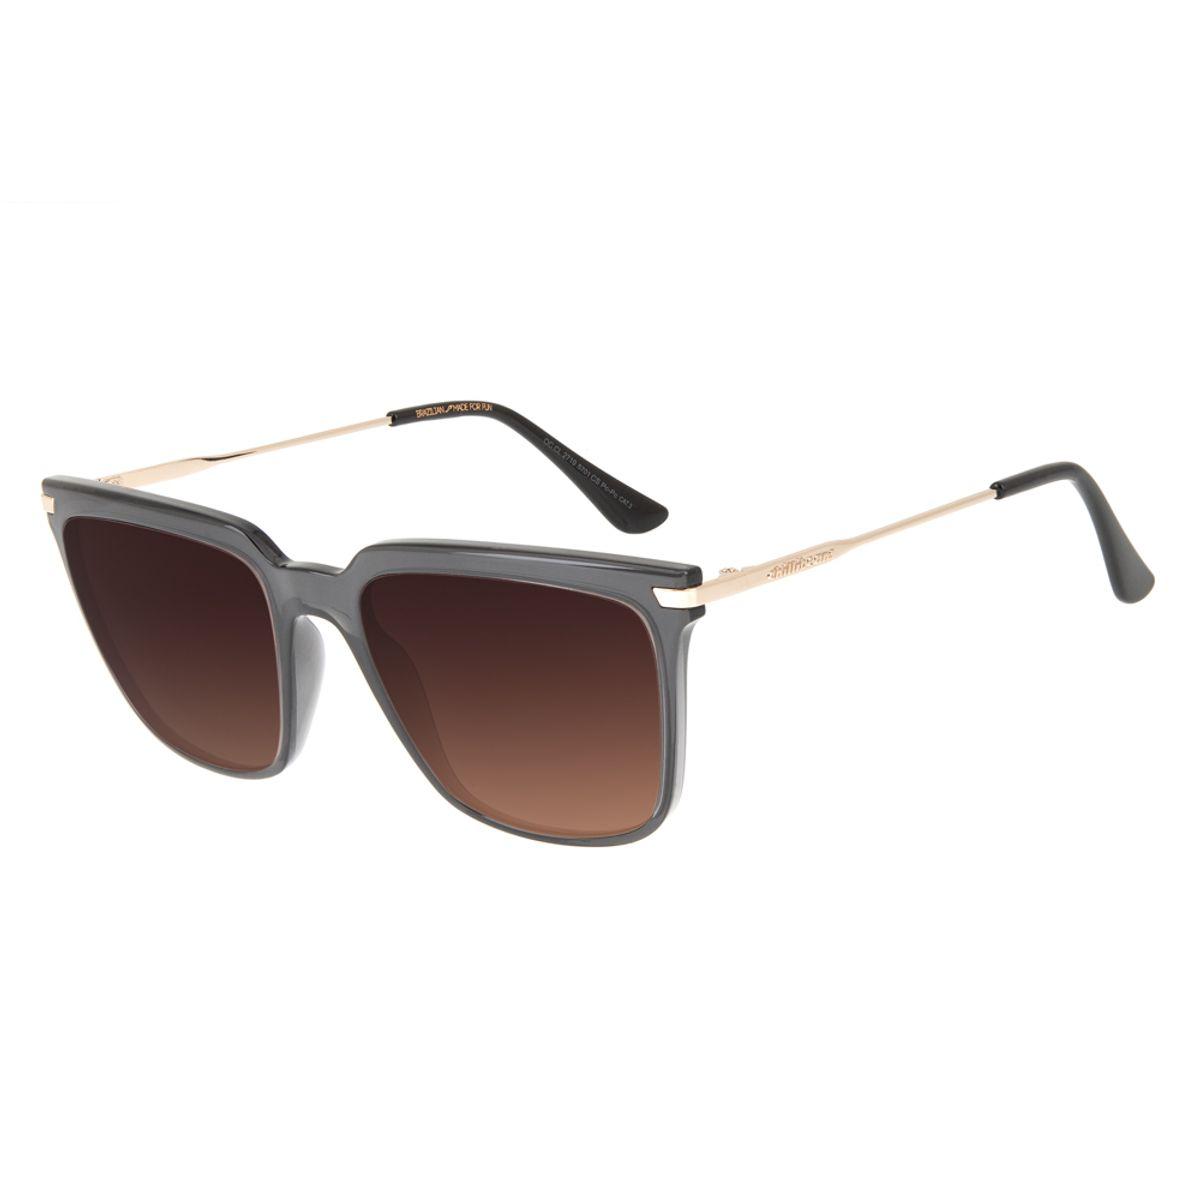 5016f79ea Óculos de Sol Chilli Beans Feminino Quadrado Degradê Marrom 2719 ...